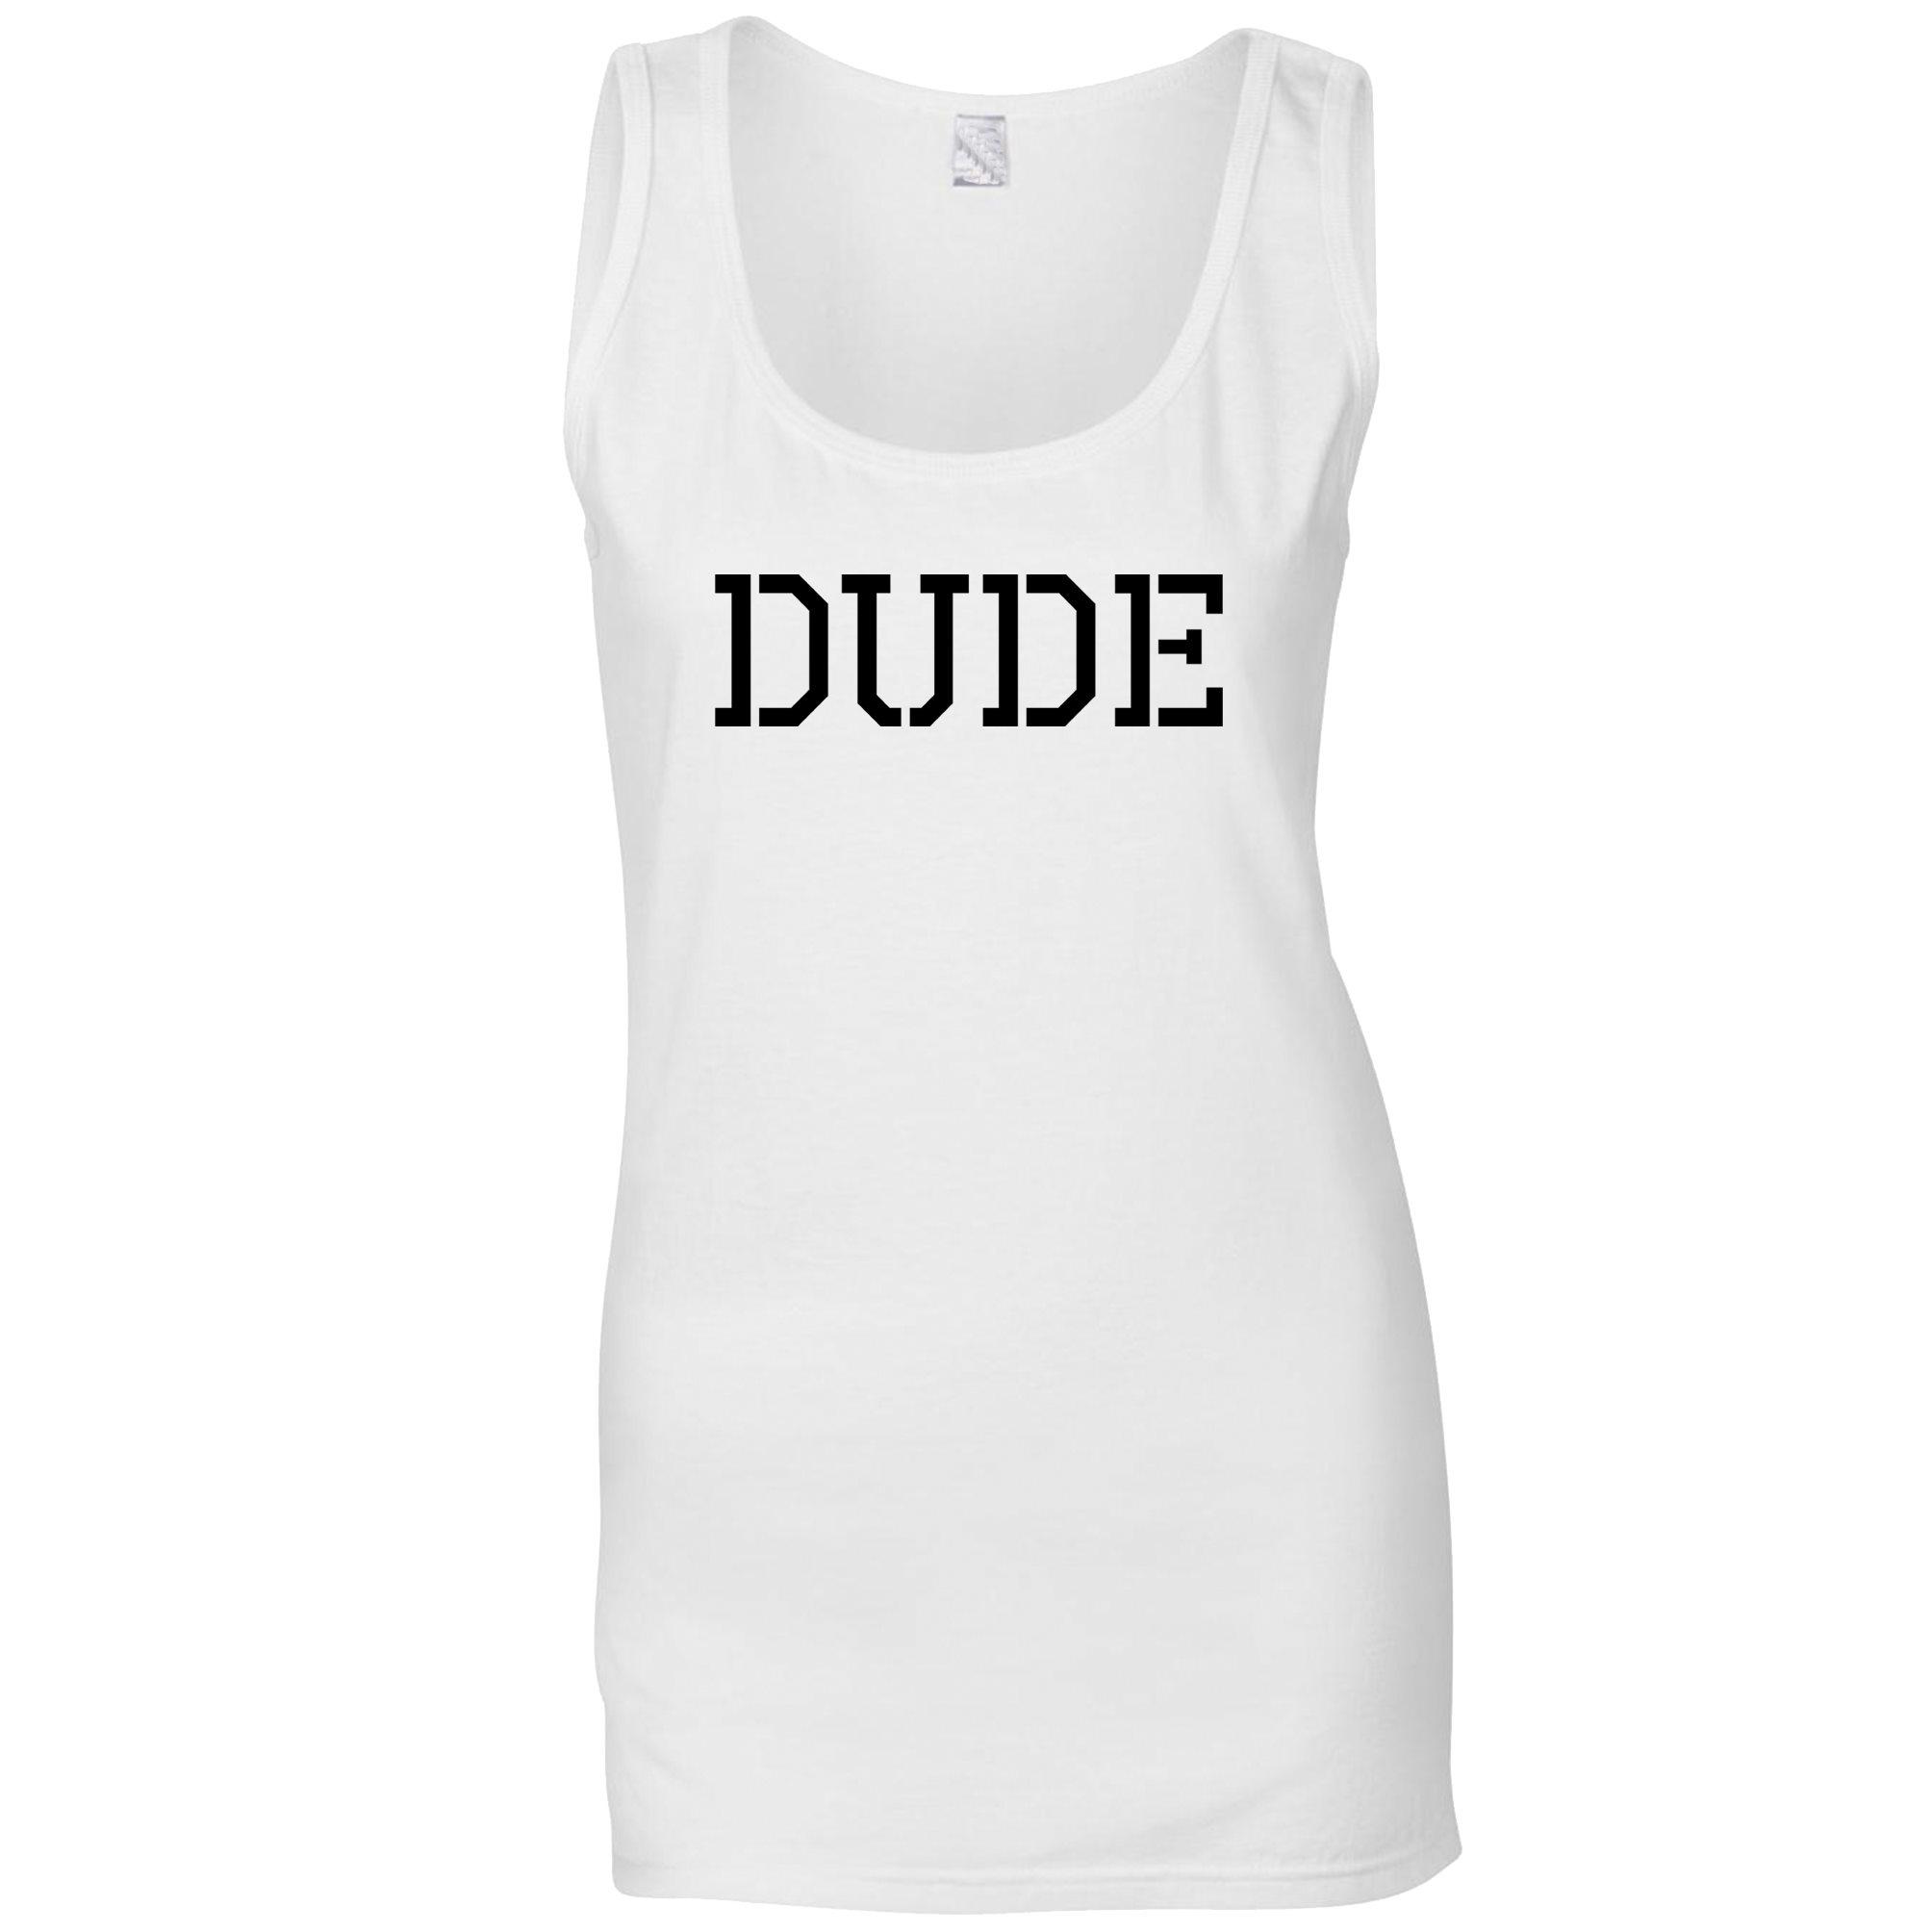 Dude Friend Mate Forever Cool Funny Men Women Unisex T Shirt Tank Top Vest 889